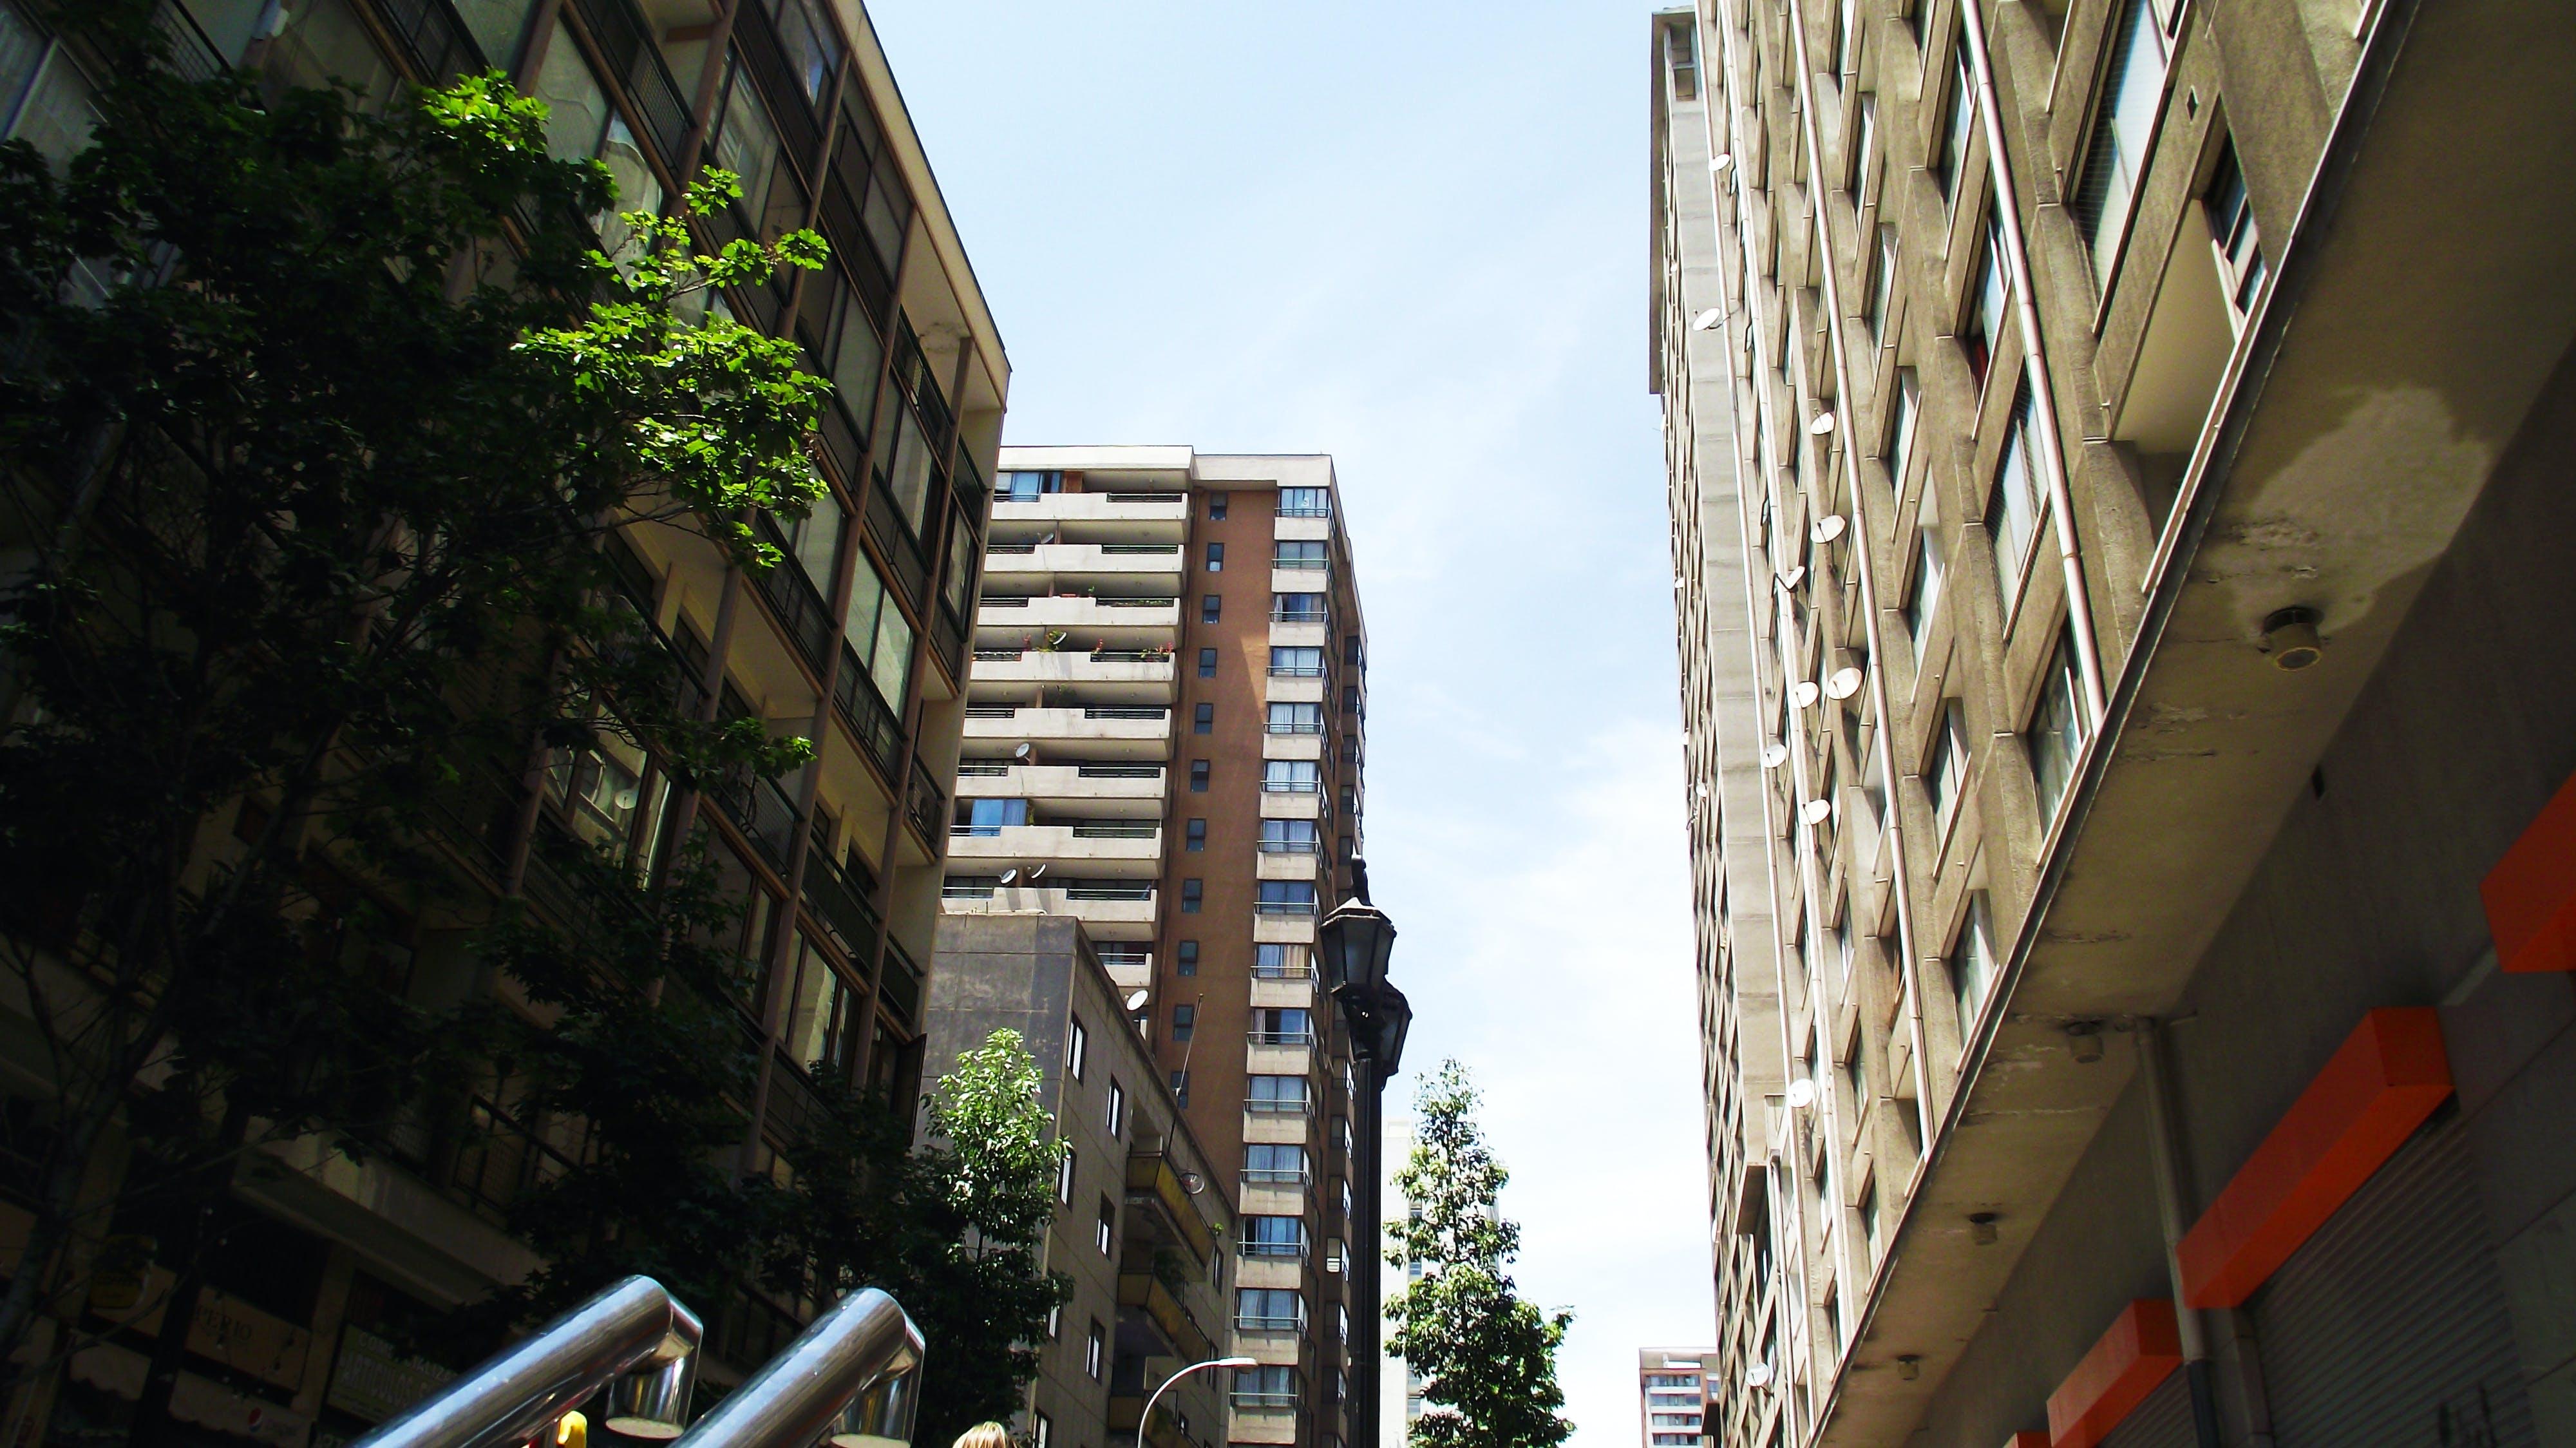 Free stock photo of sky, architecture, subway